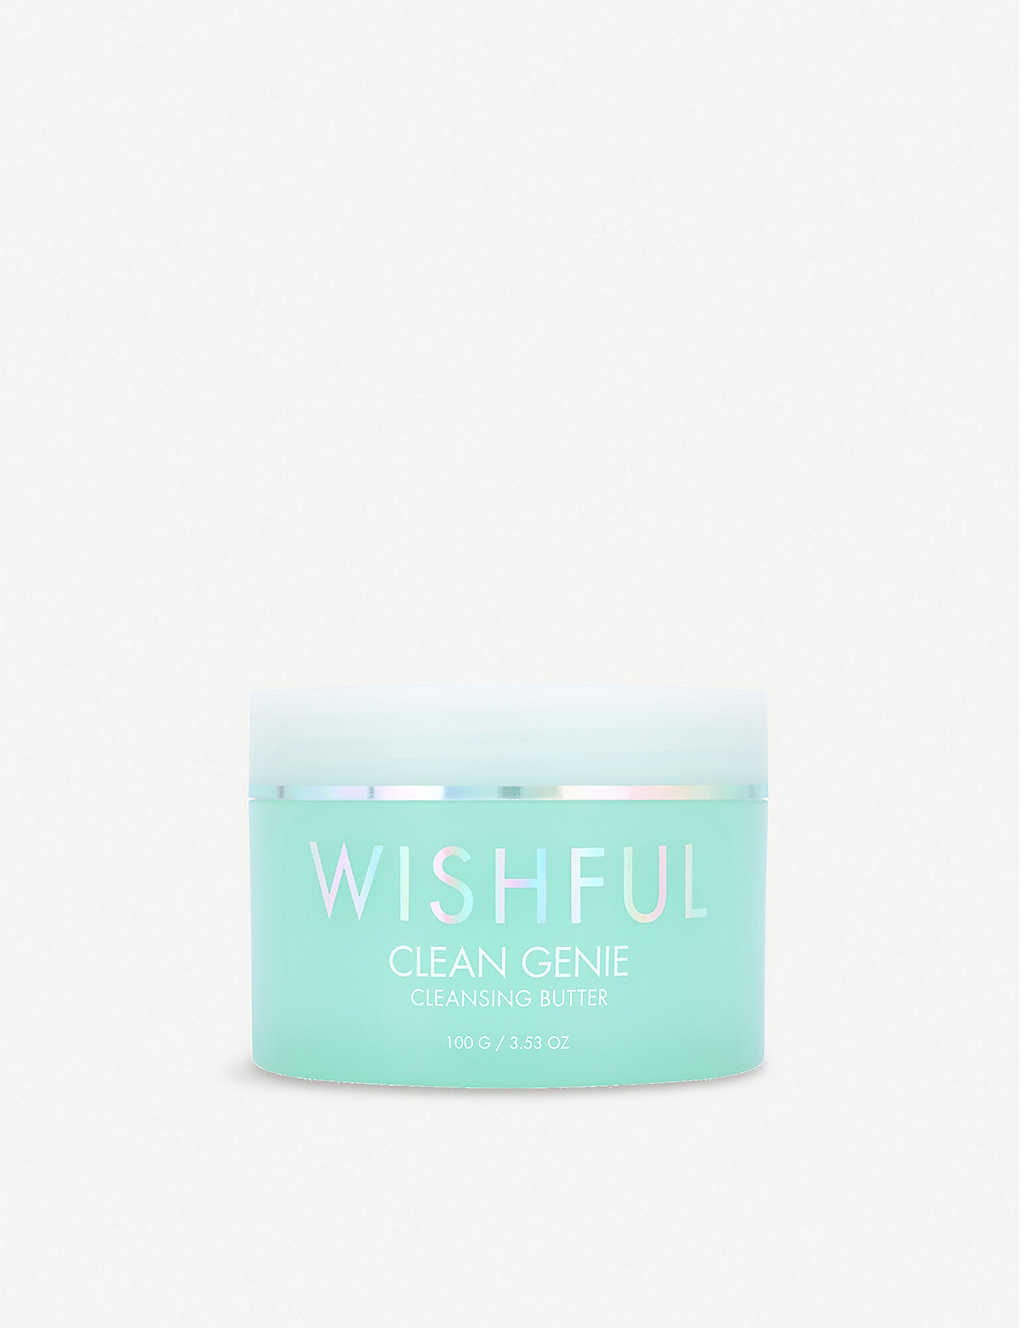 Huda Beauty Wishful Clean Genie Cleansing Butter 100g